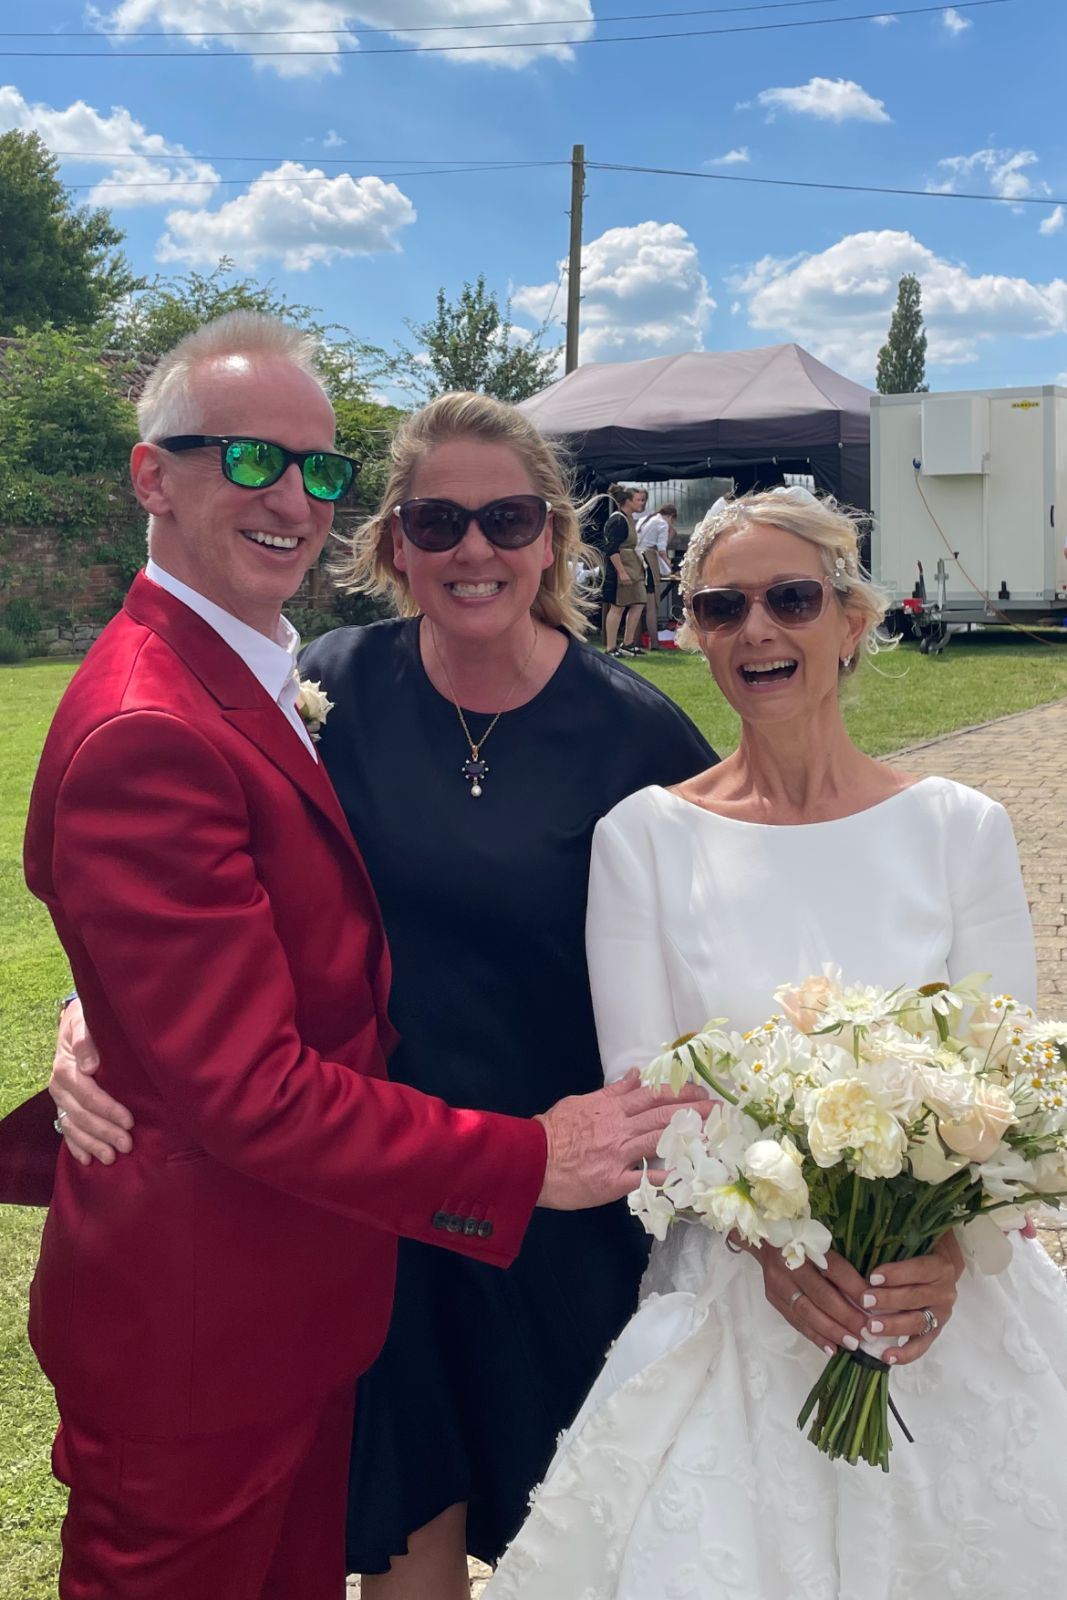 wedding ceremony, couple with Bristol celebrant Tara Health-Arnold